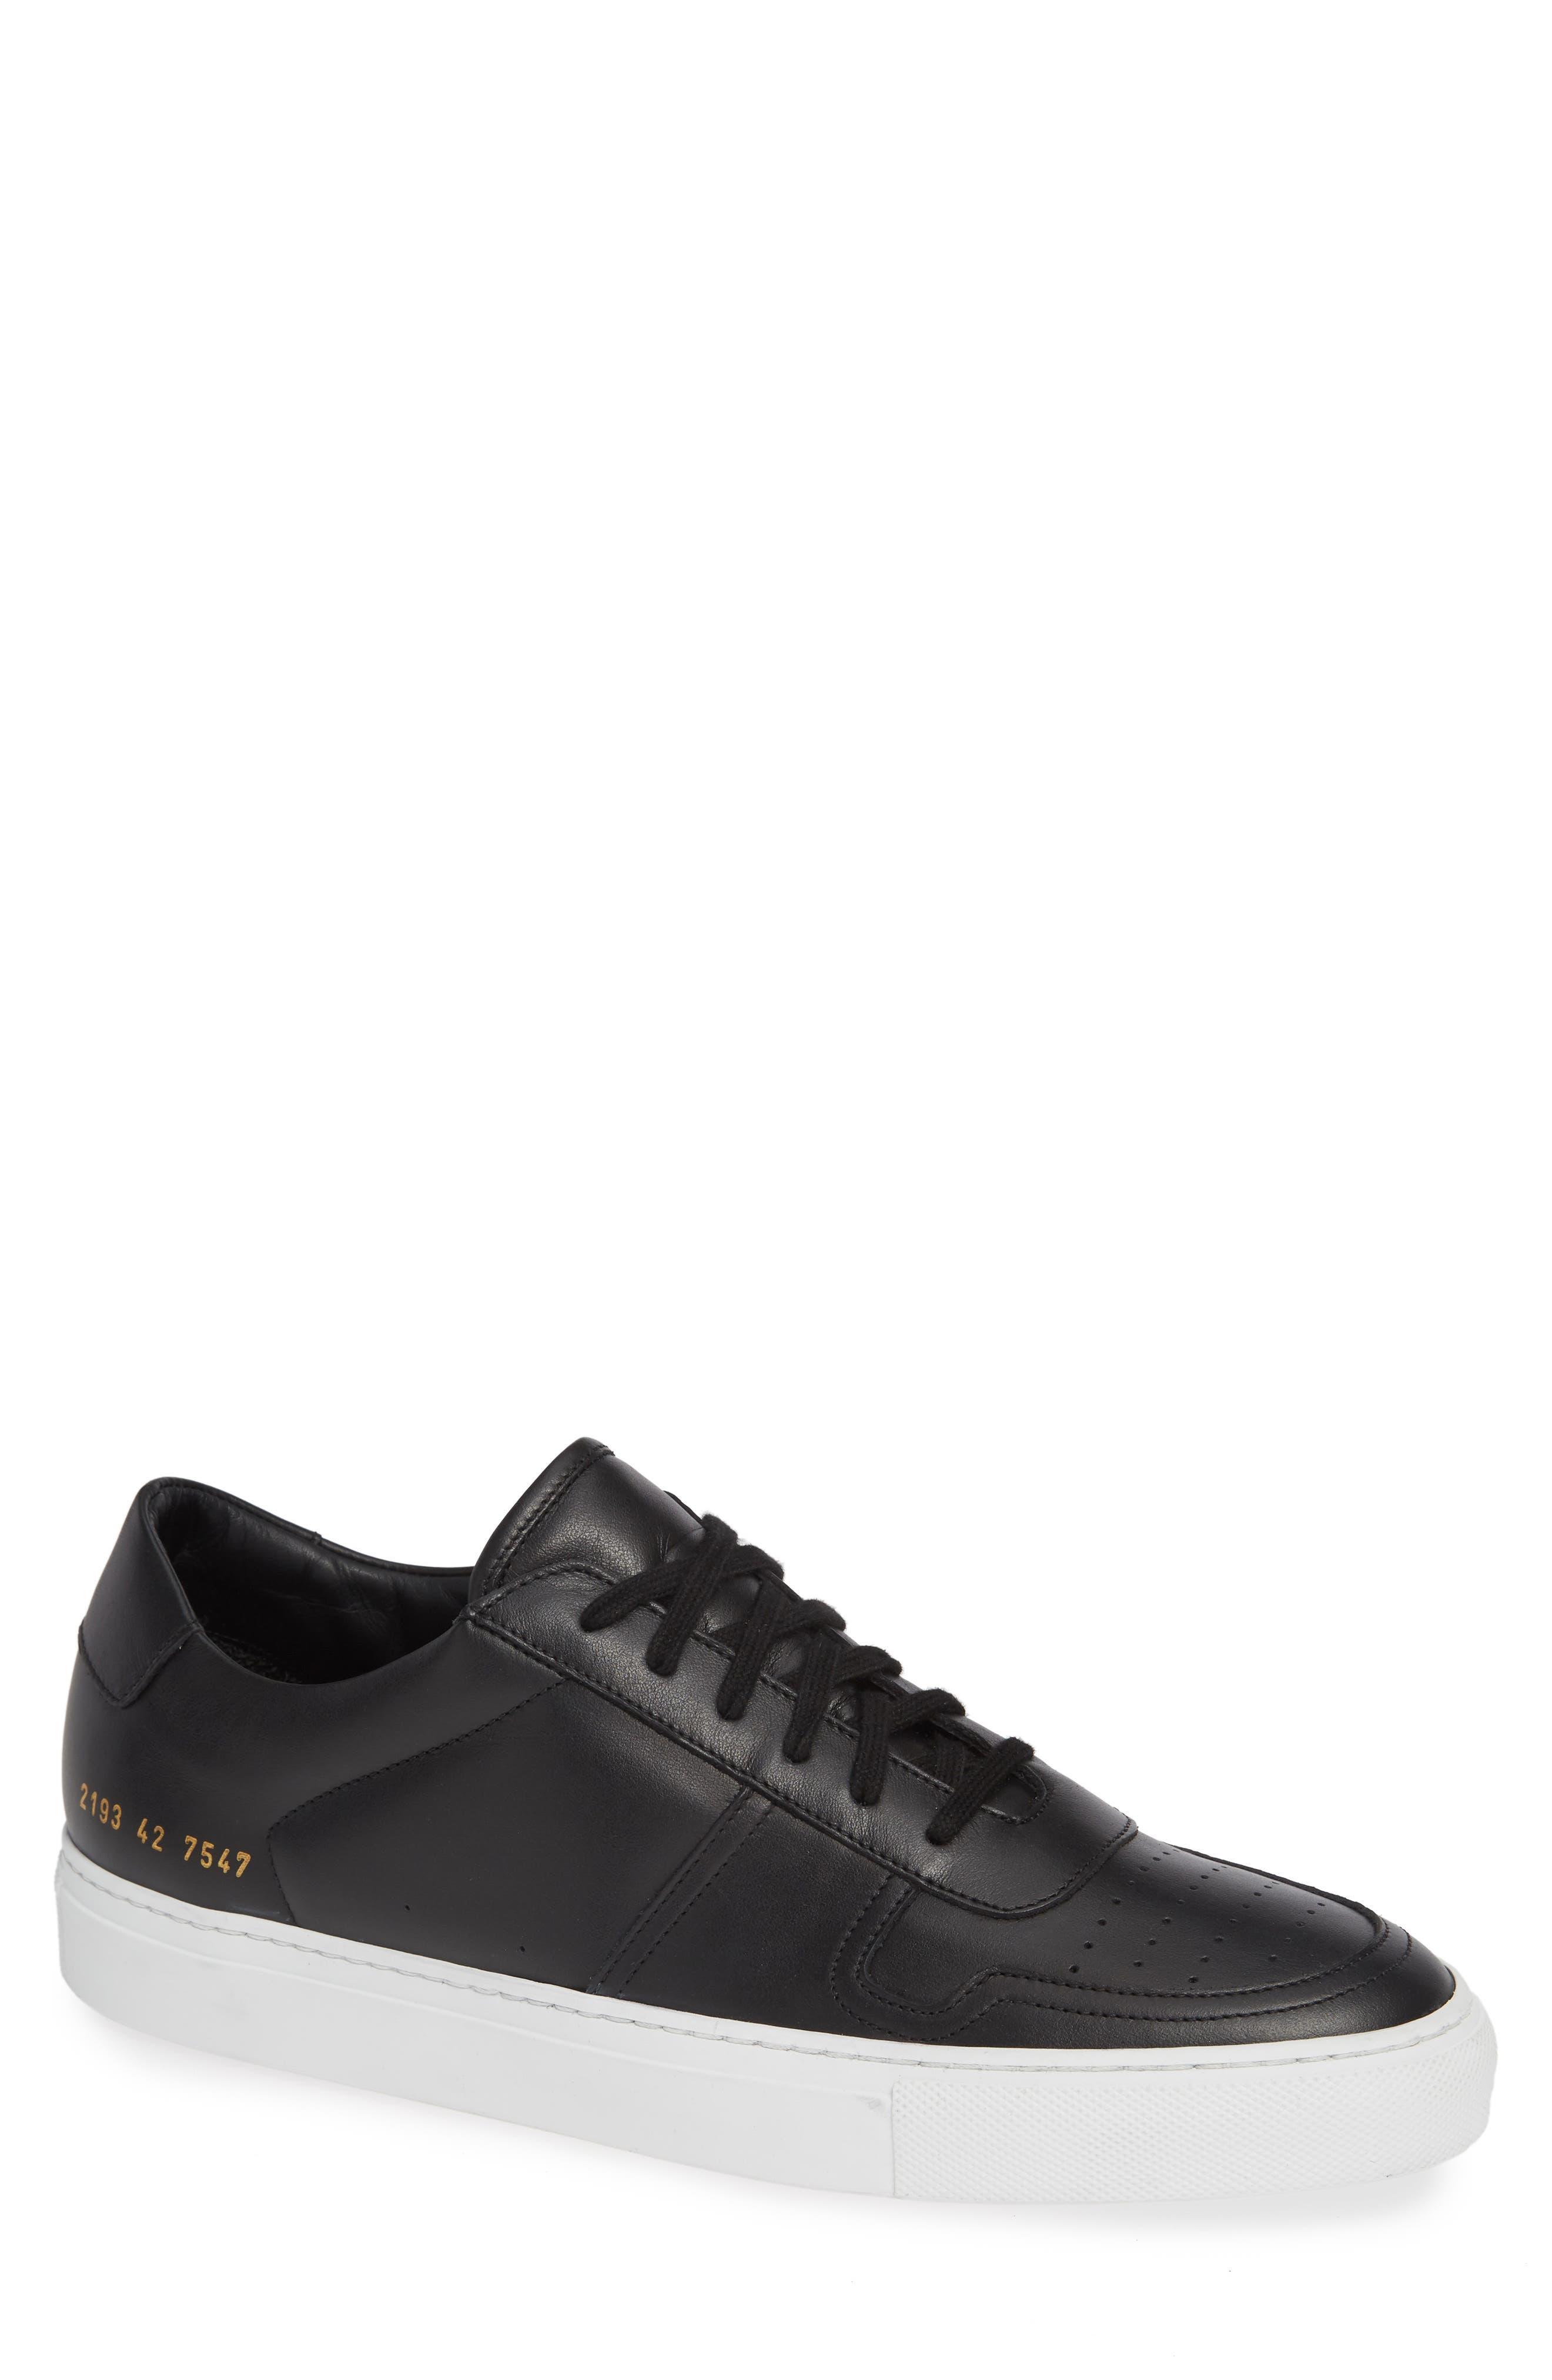 Bball Low Top Sneaker,                             Main thumbnail 1, color,                             BLACK